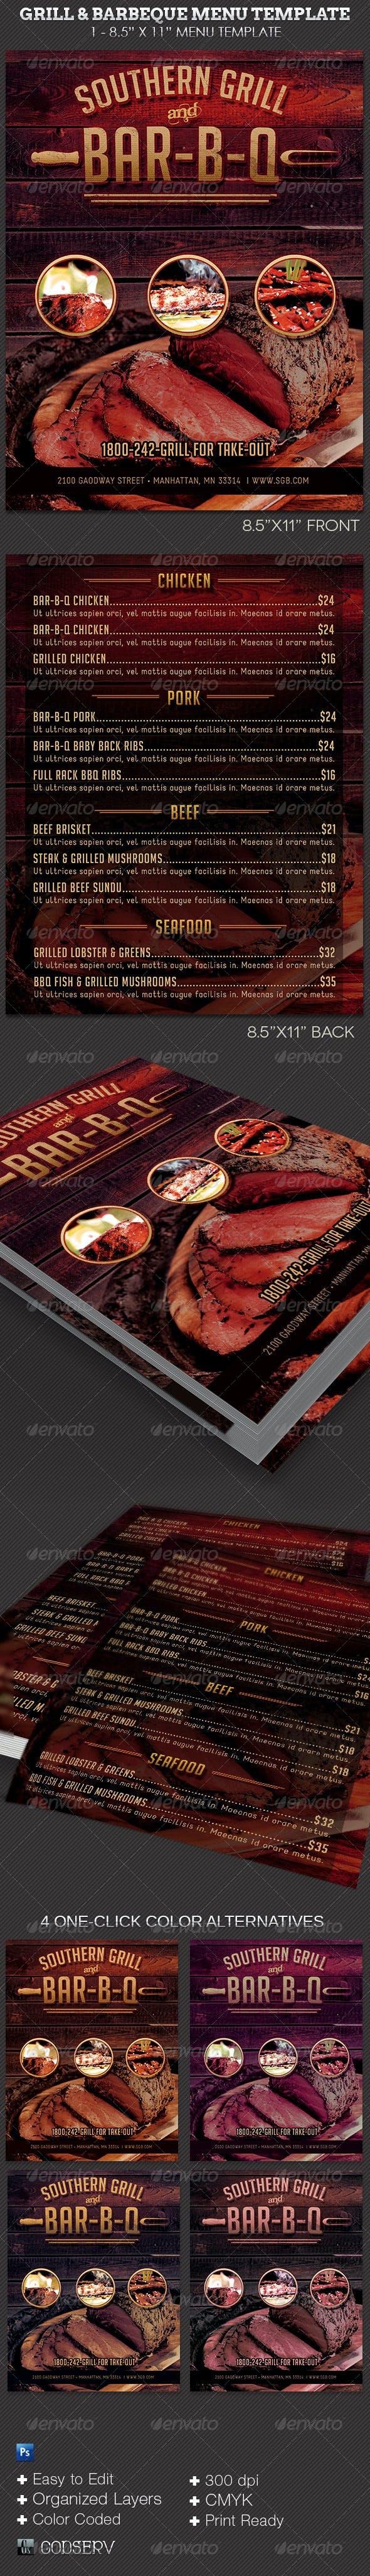 grill barbecue restaurant menu template by godserv graphicriver